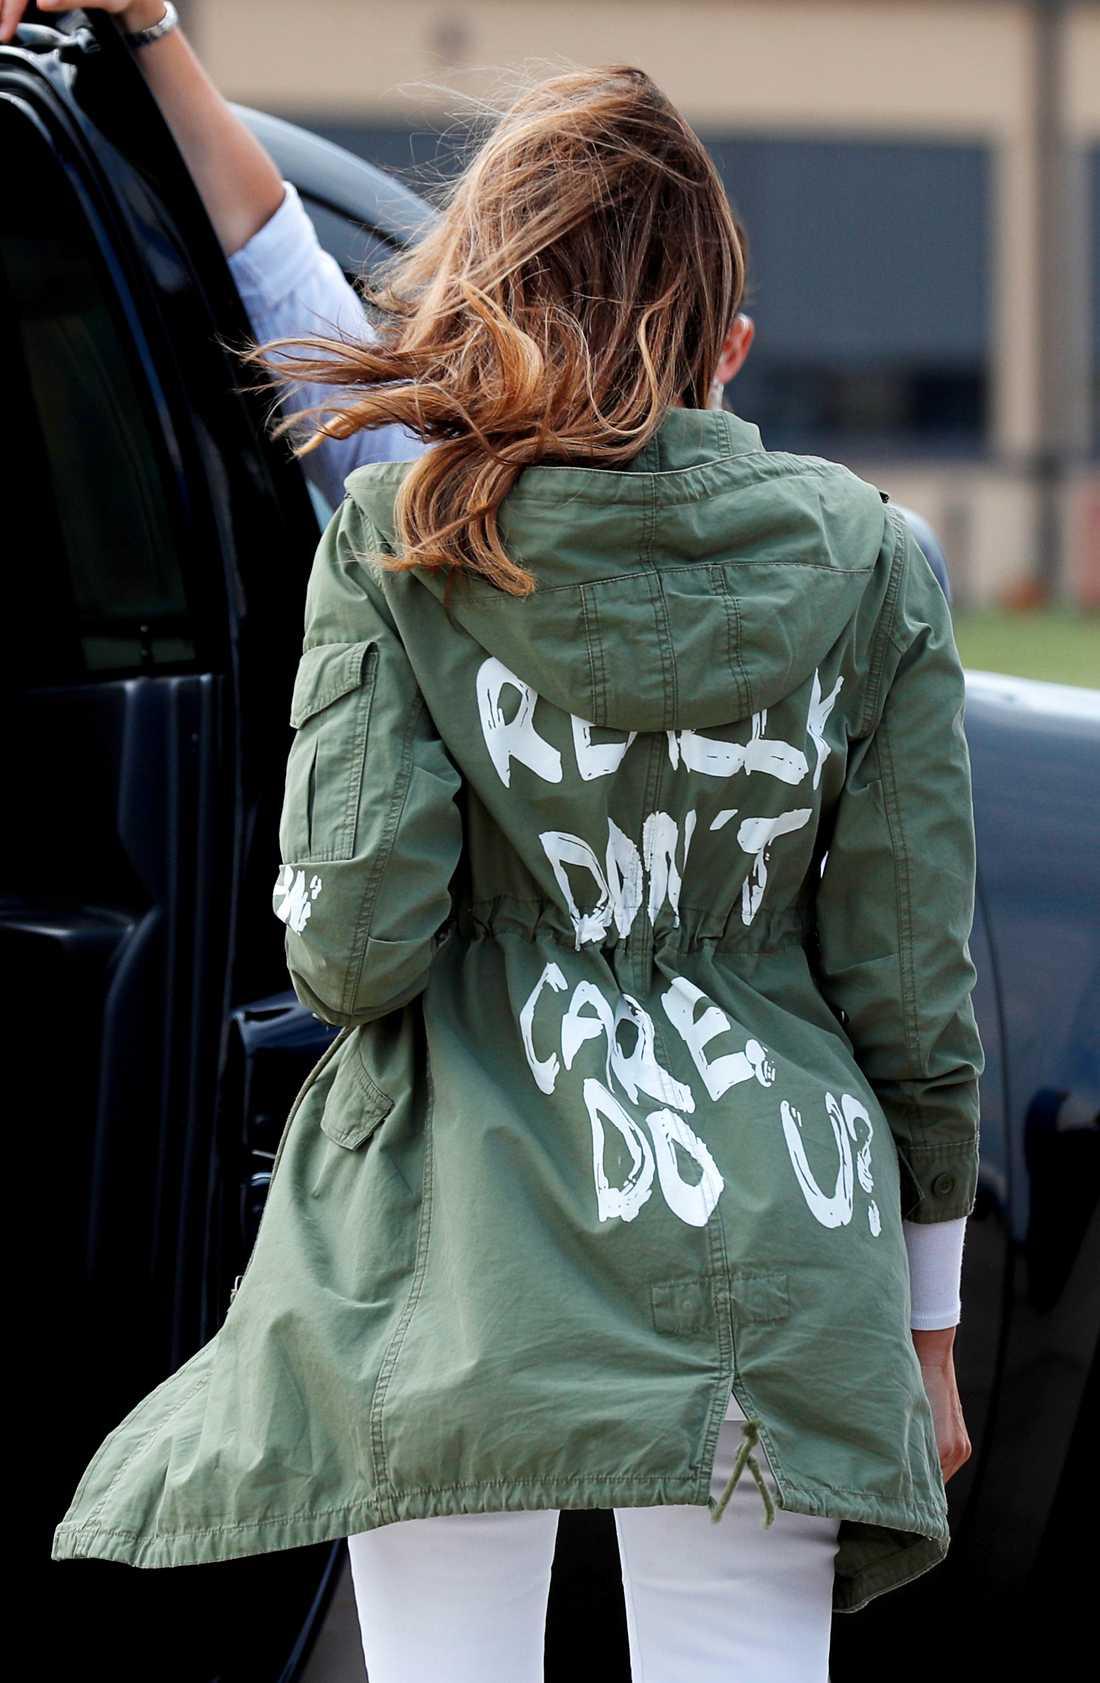 Melania Trumps omtalade jacka.